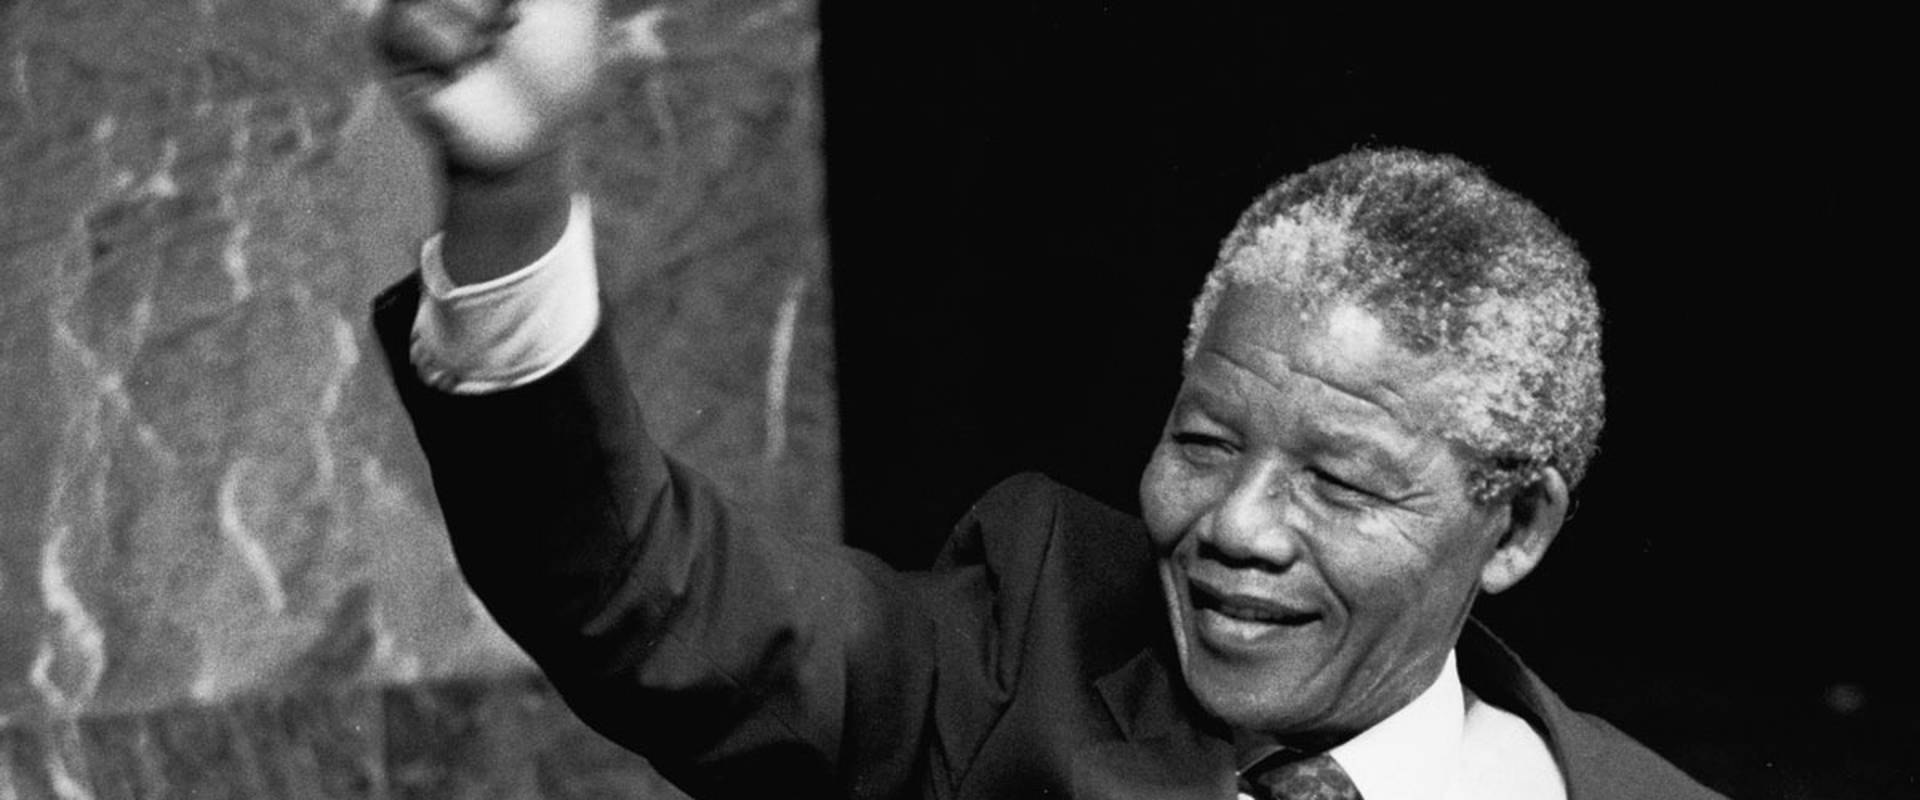 Nelson Mandela An Inspirational Life Peace Insight